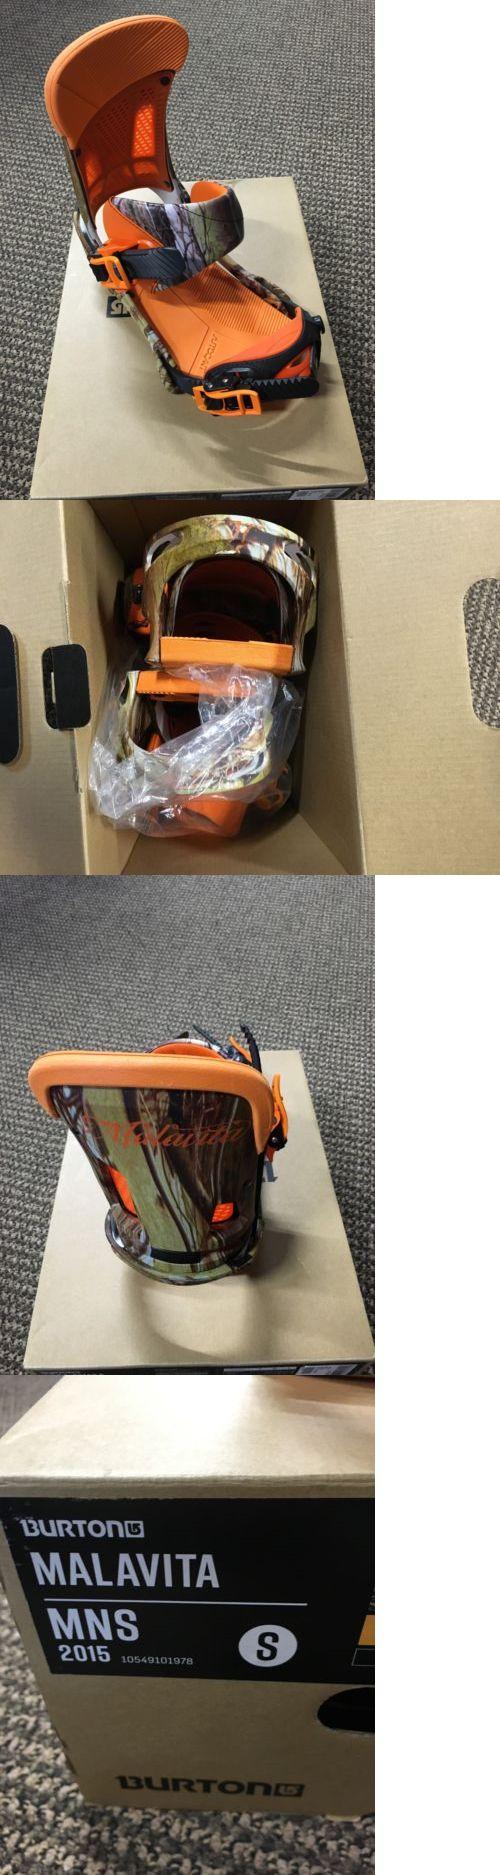 Bindings 21248: 2015 Burton Malavita S *New In Box* -> BUY IT NOW ONLY: $129 on eBay!